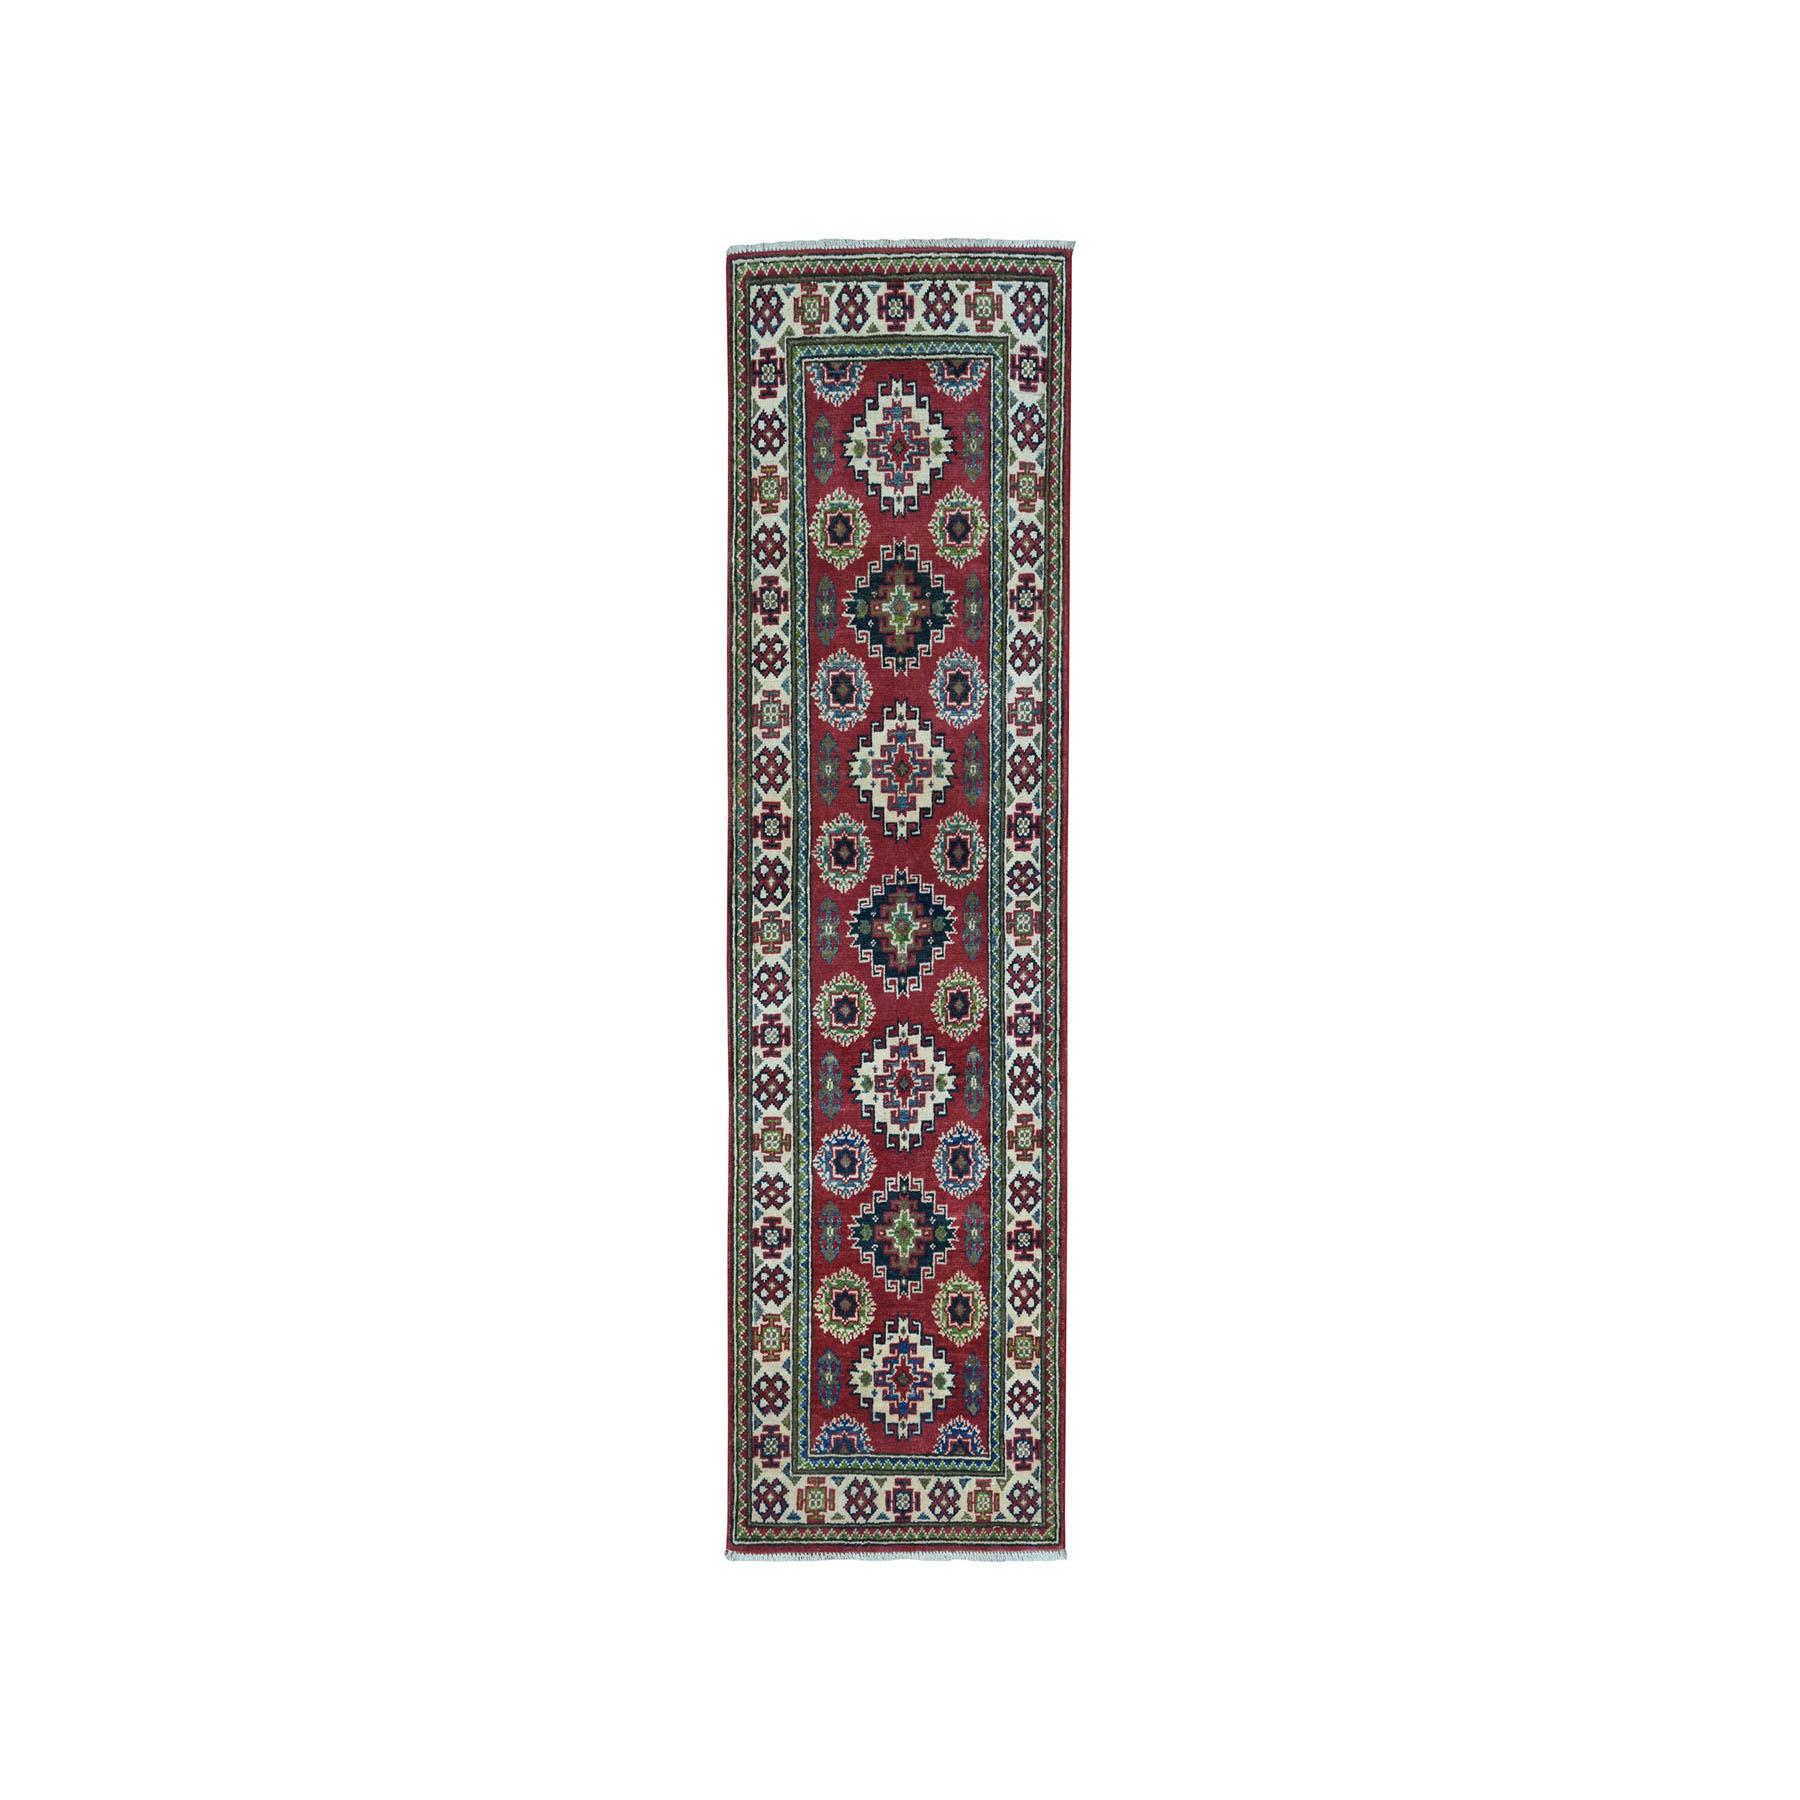 "2'X5'7"" Red Super Kazak Pure Wool Geometric Design Hand-Knotted Runner Oriental Rug moaea06b"